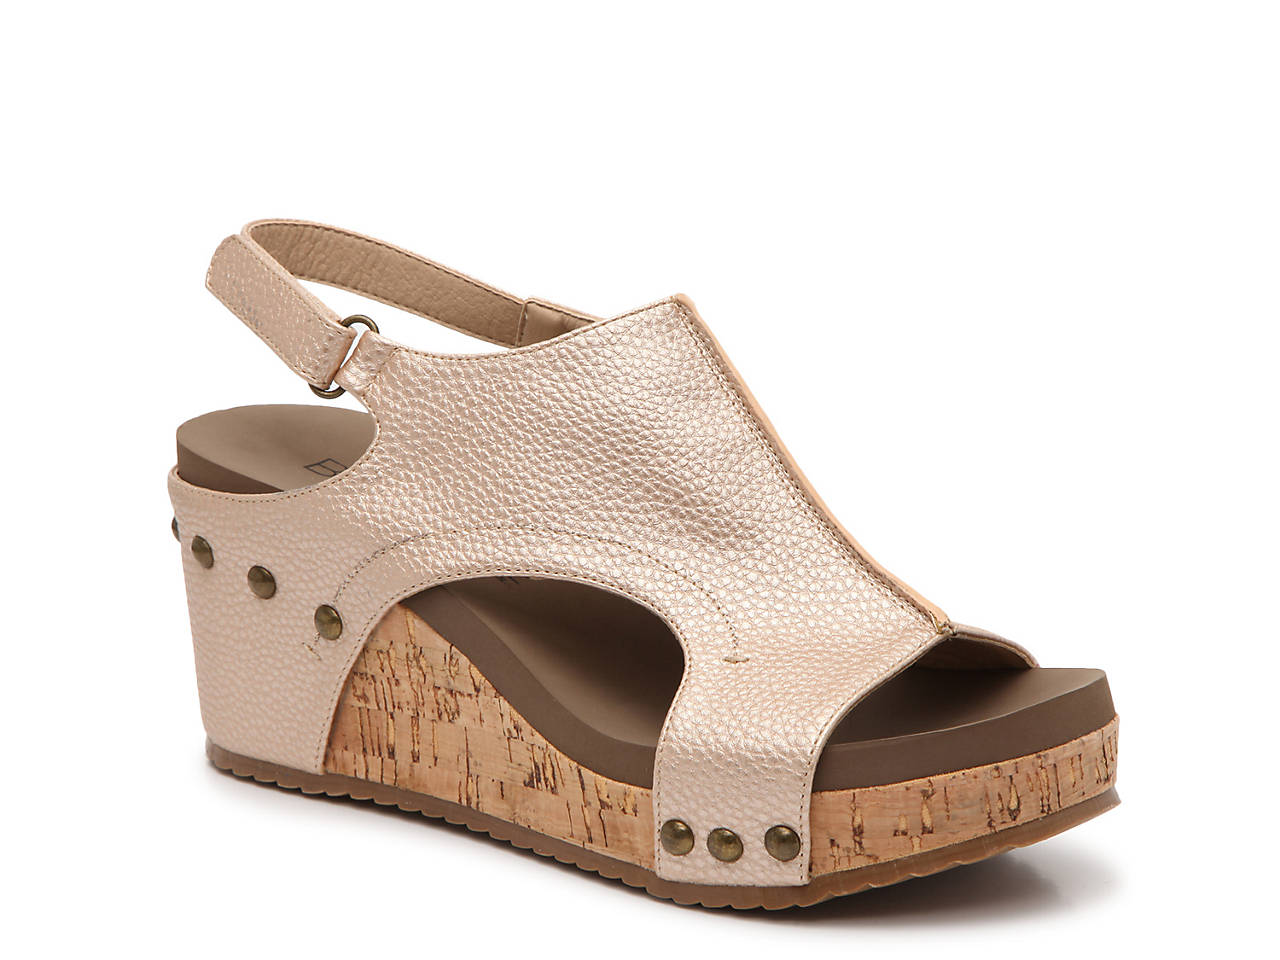 f3d3e62fb8c Corkys London Wedge Sandal Women s Shoes